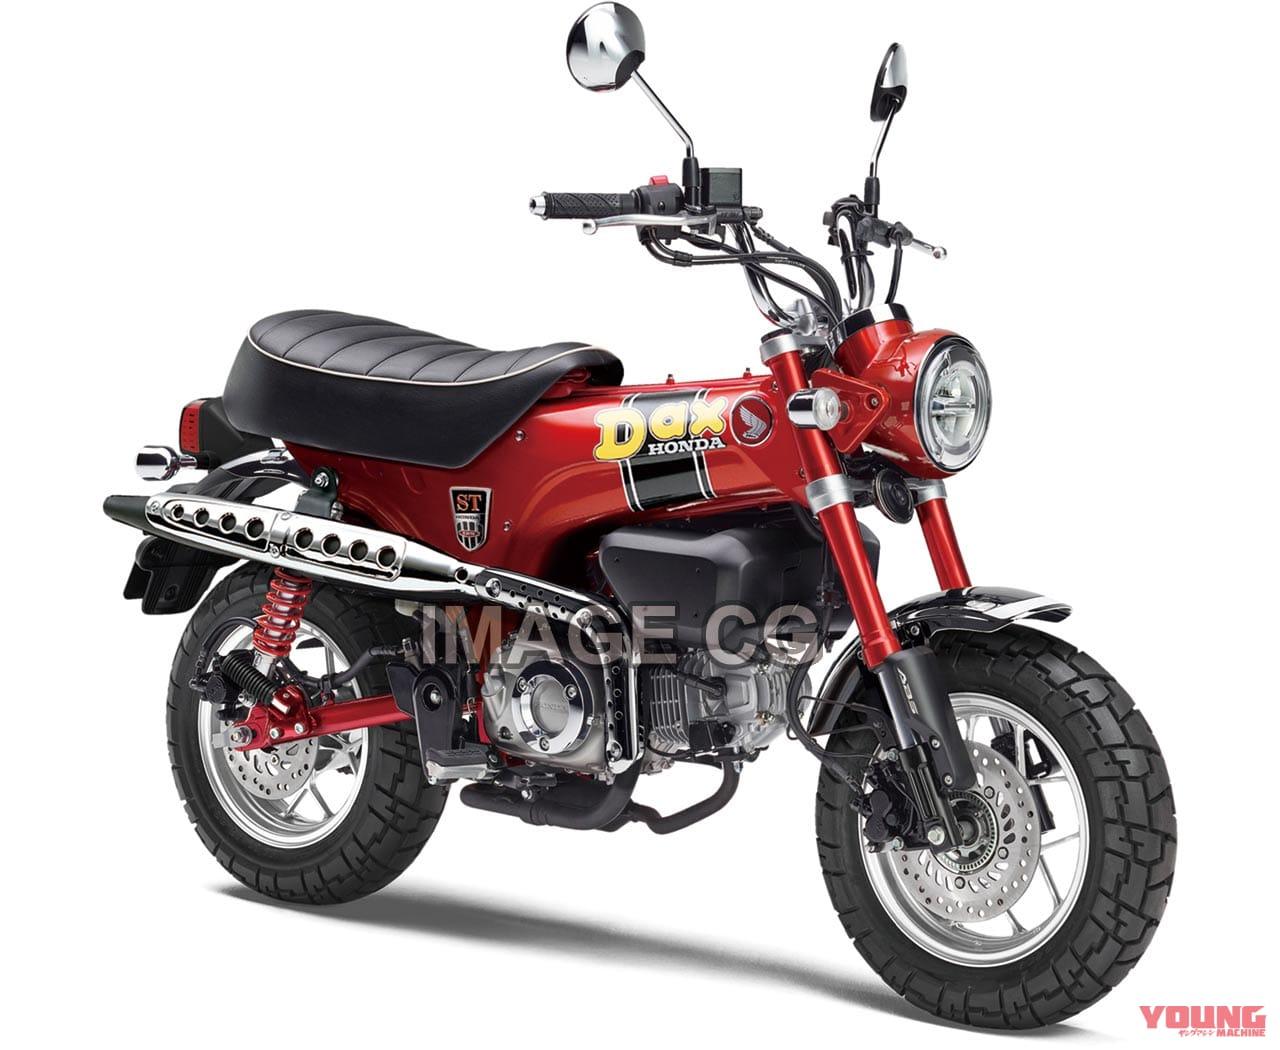 Honda ST125 Dax chuẩn bị